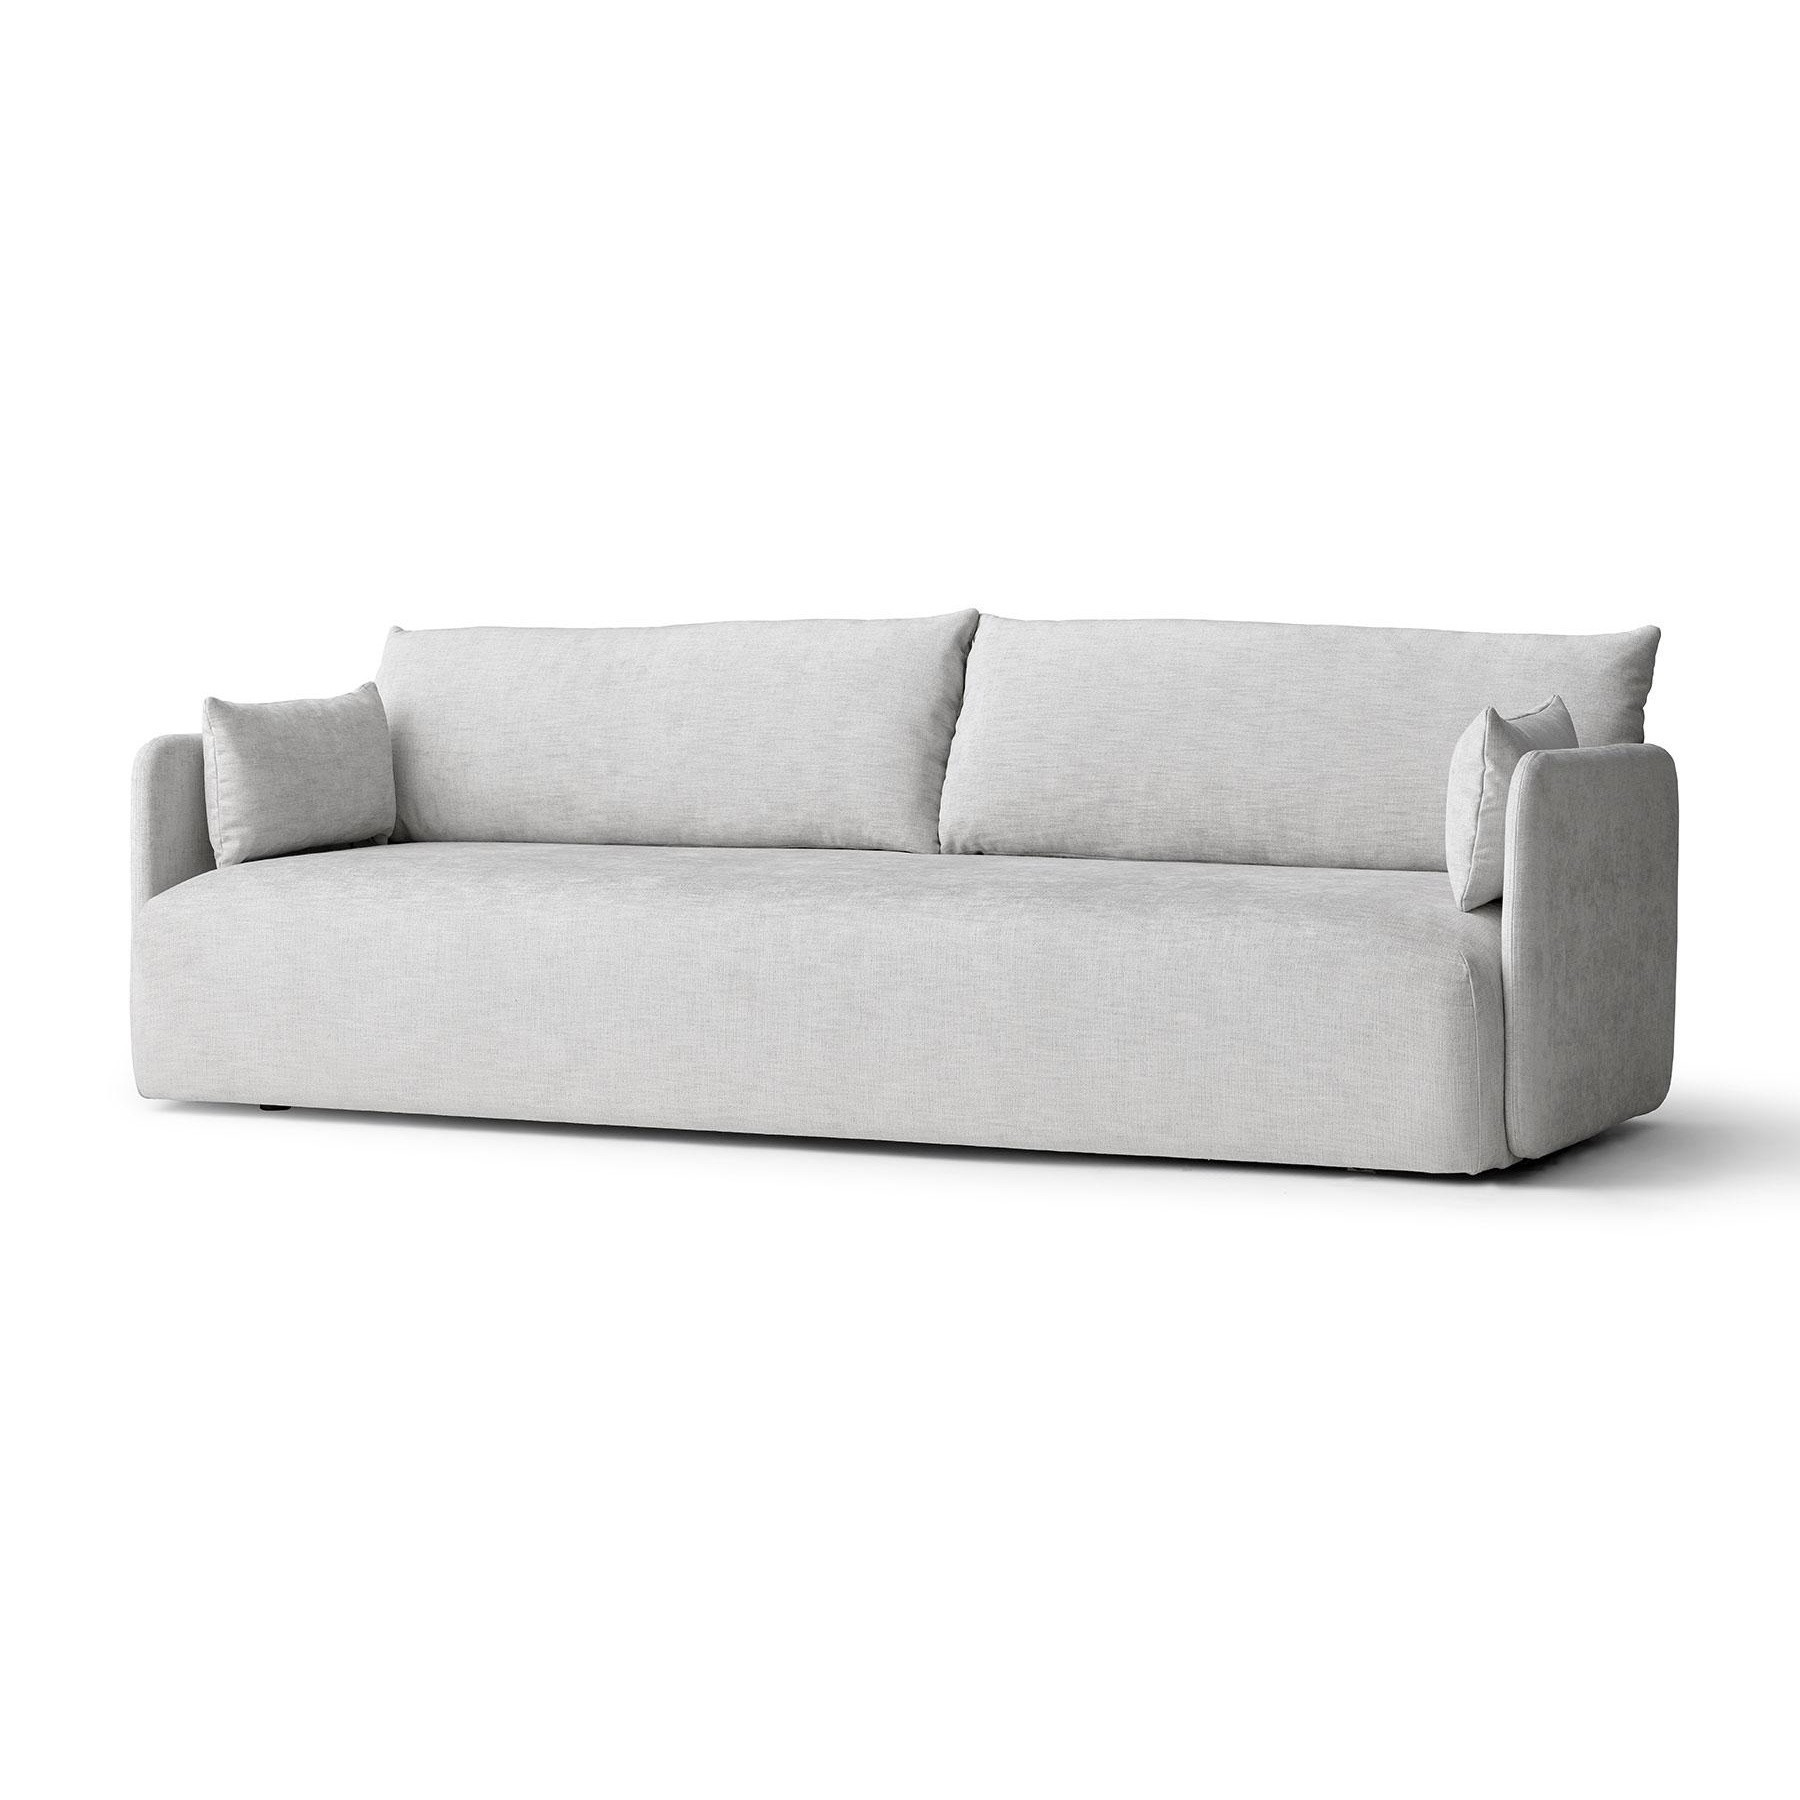 Menu Offset Sofa 3 Seater Ambientedirect